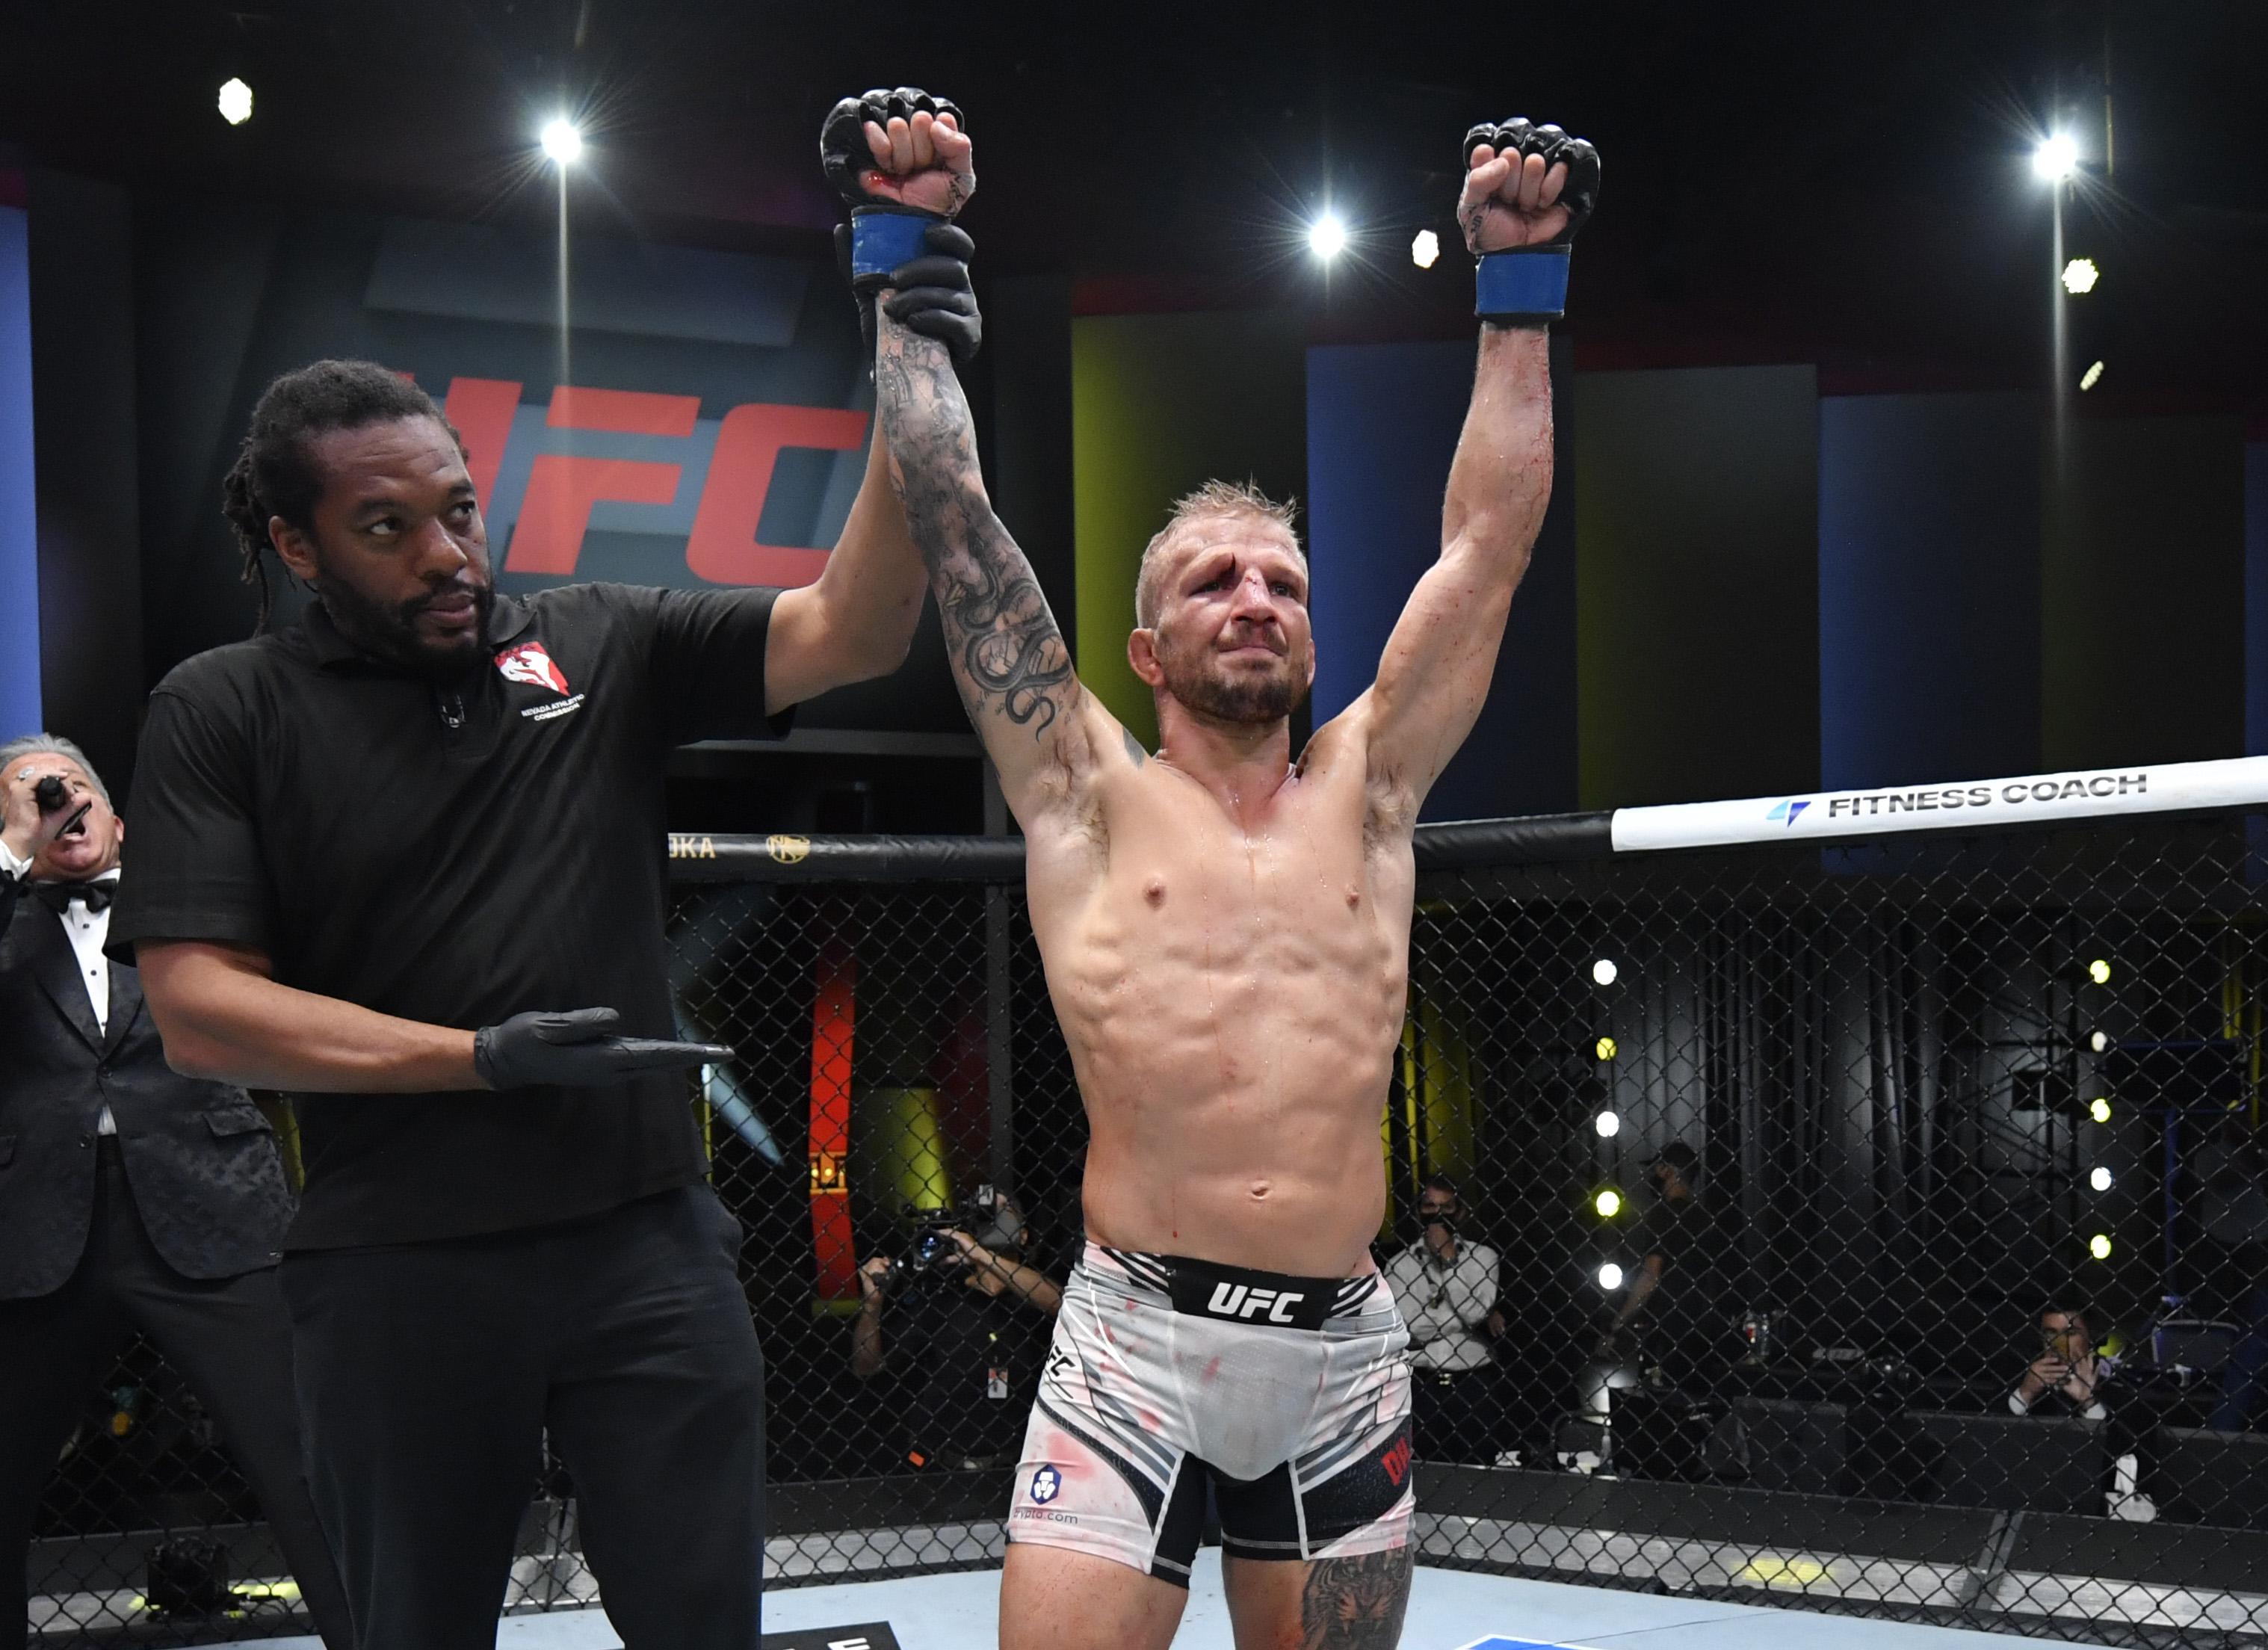 T.J. Dillashaw after his split decision victory over Cory Sandhagen at UFC Vegas 32.